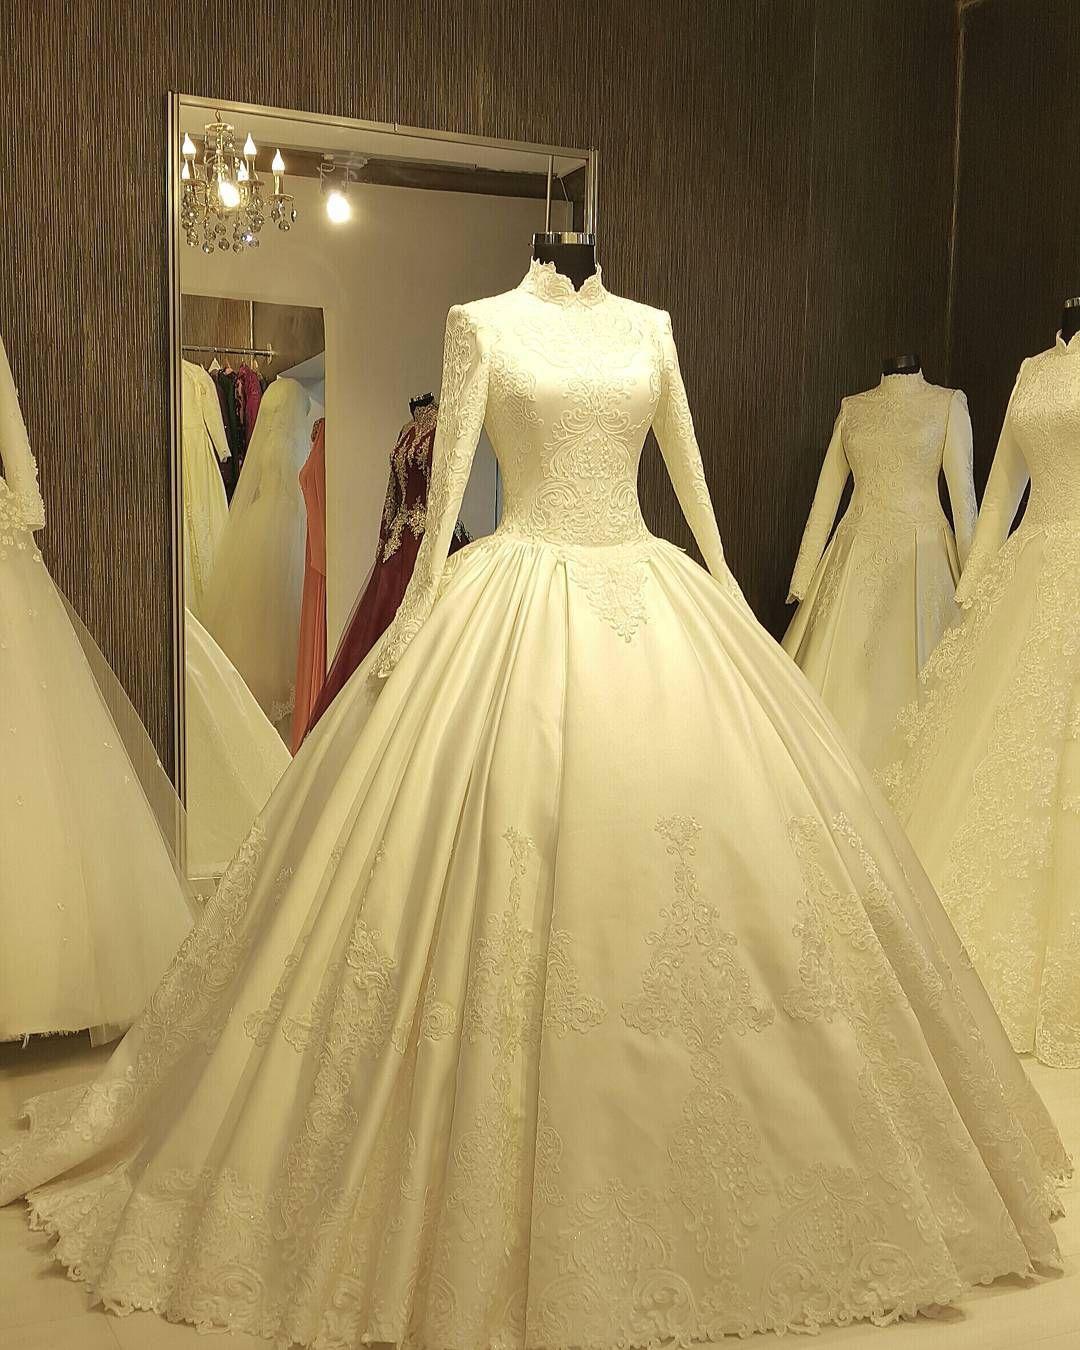 Pin by aysenur baskal on düğünler pinterest wedding dress